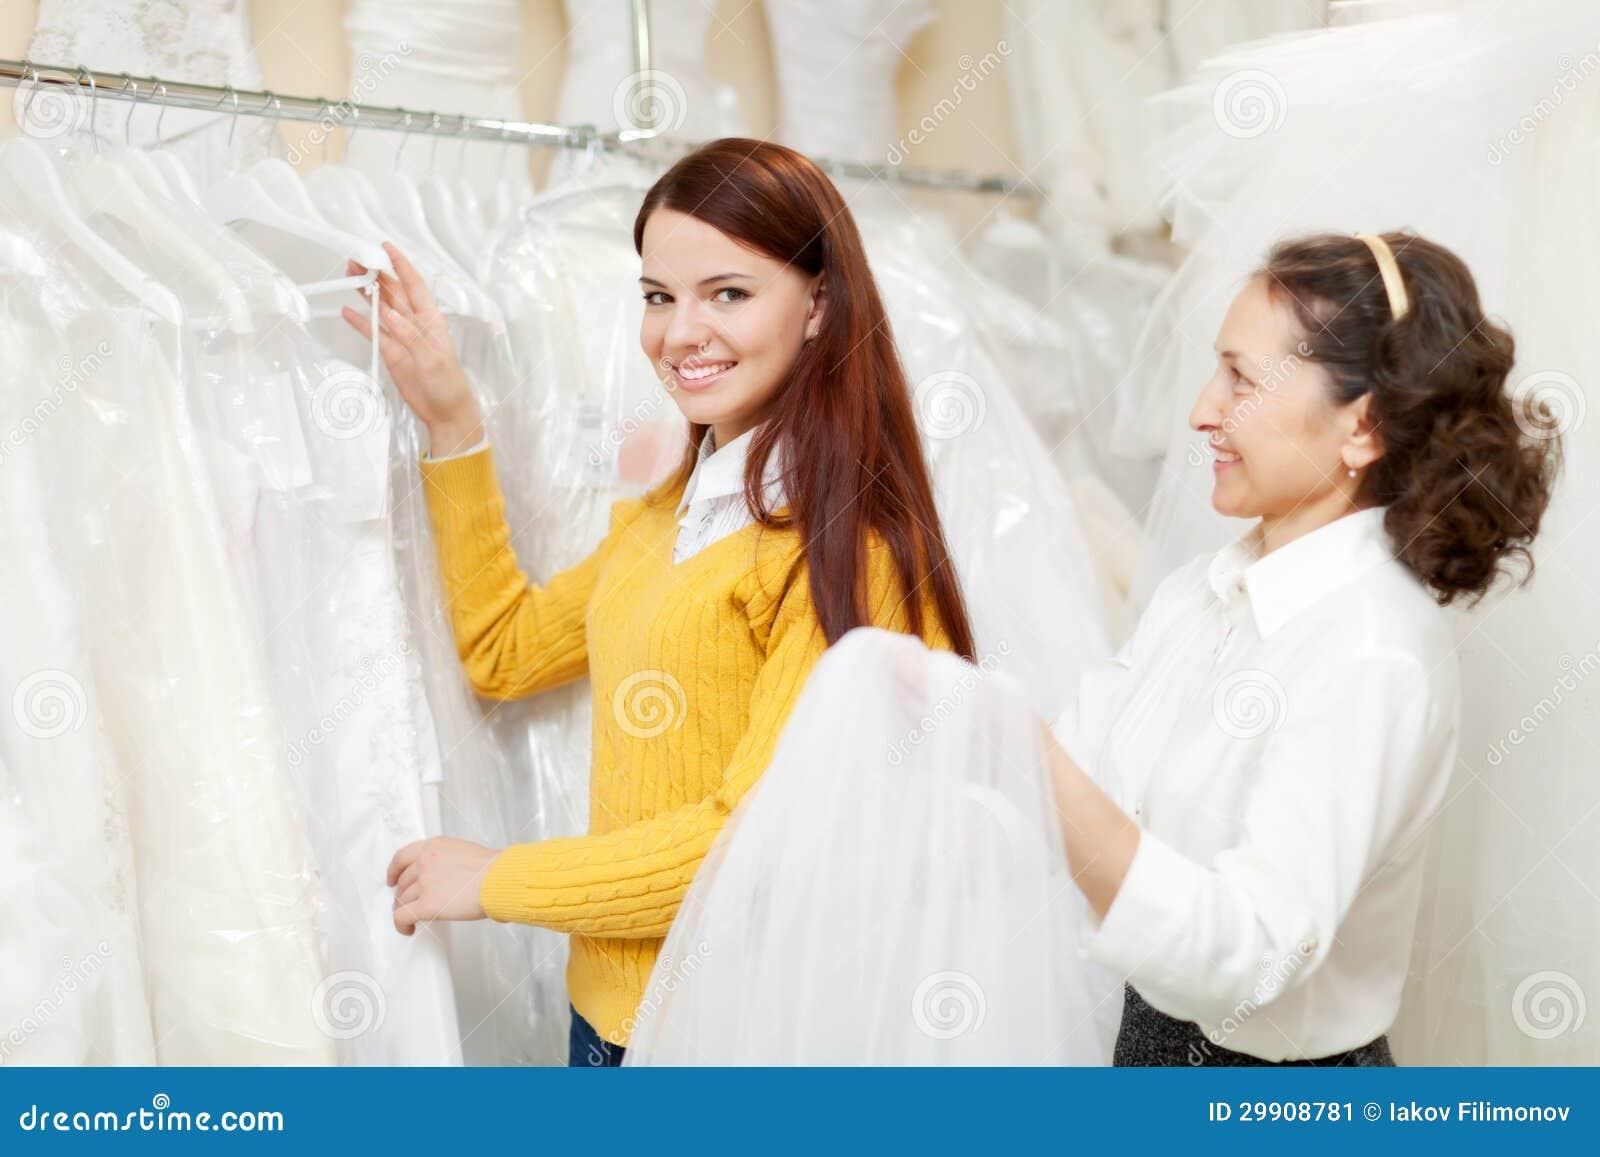 Idea mature bride thumbs think